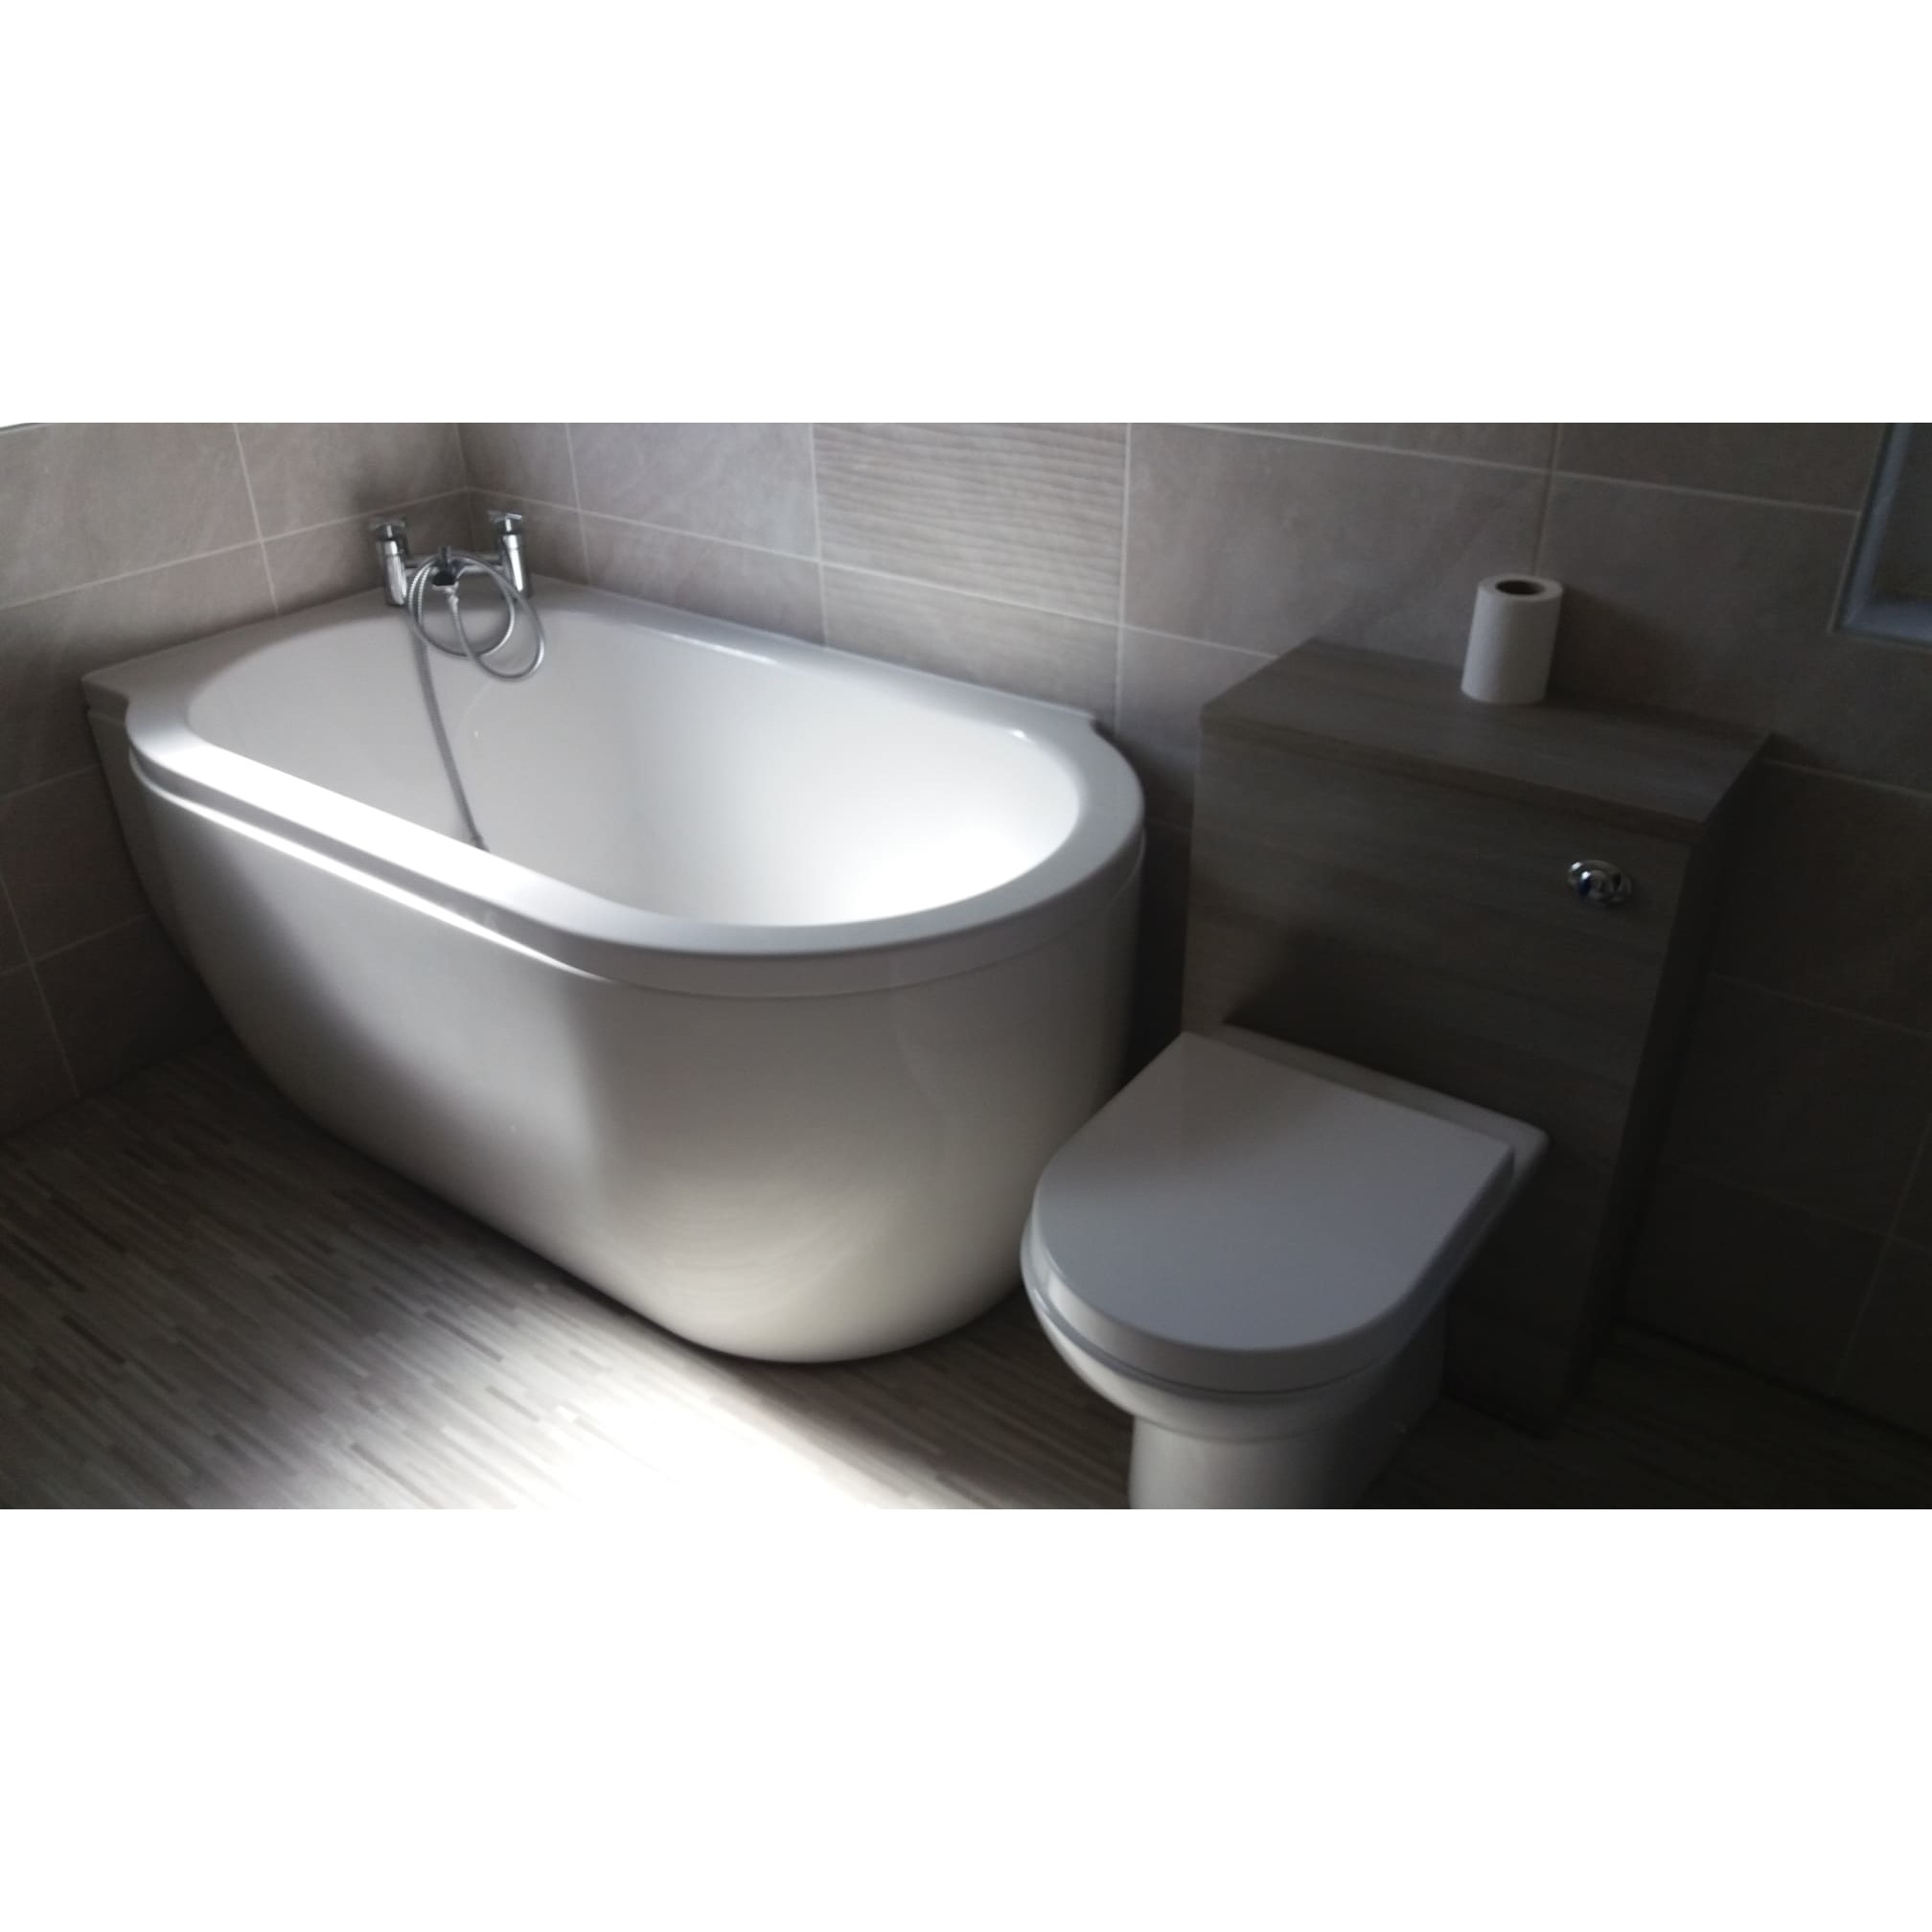 New Creation Bathroom Supplies - Stockport, Cheshire SK5 6DA - 07938 103515 | ShowMeLocal.com